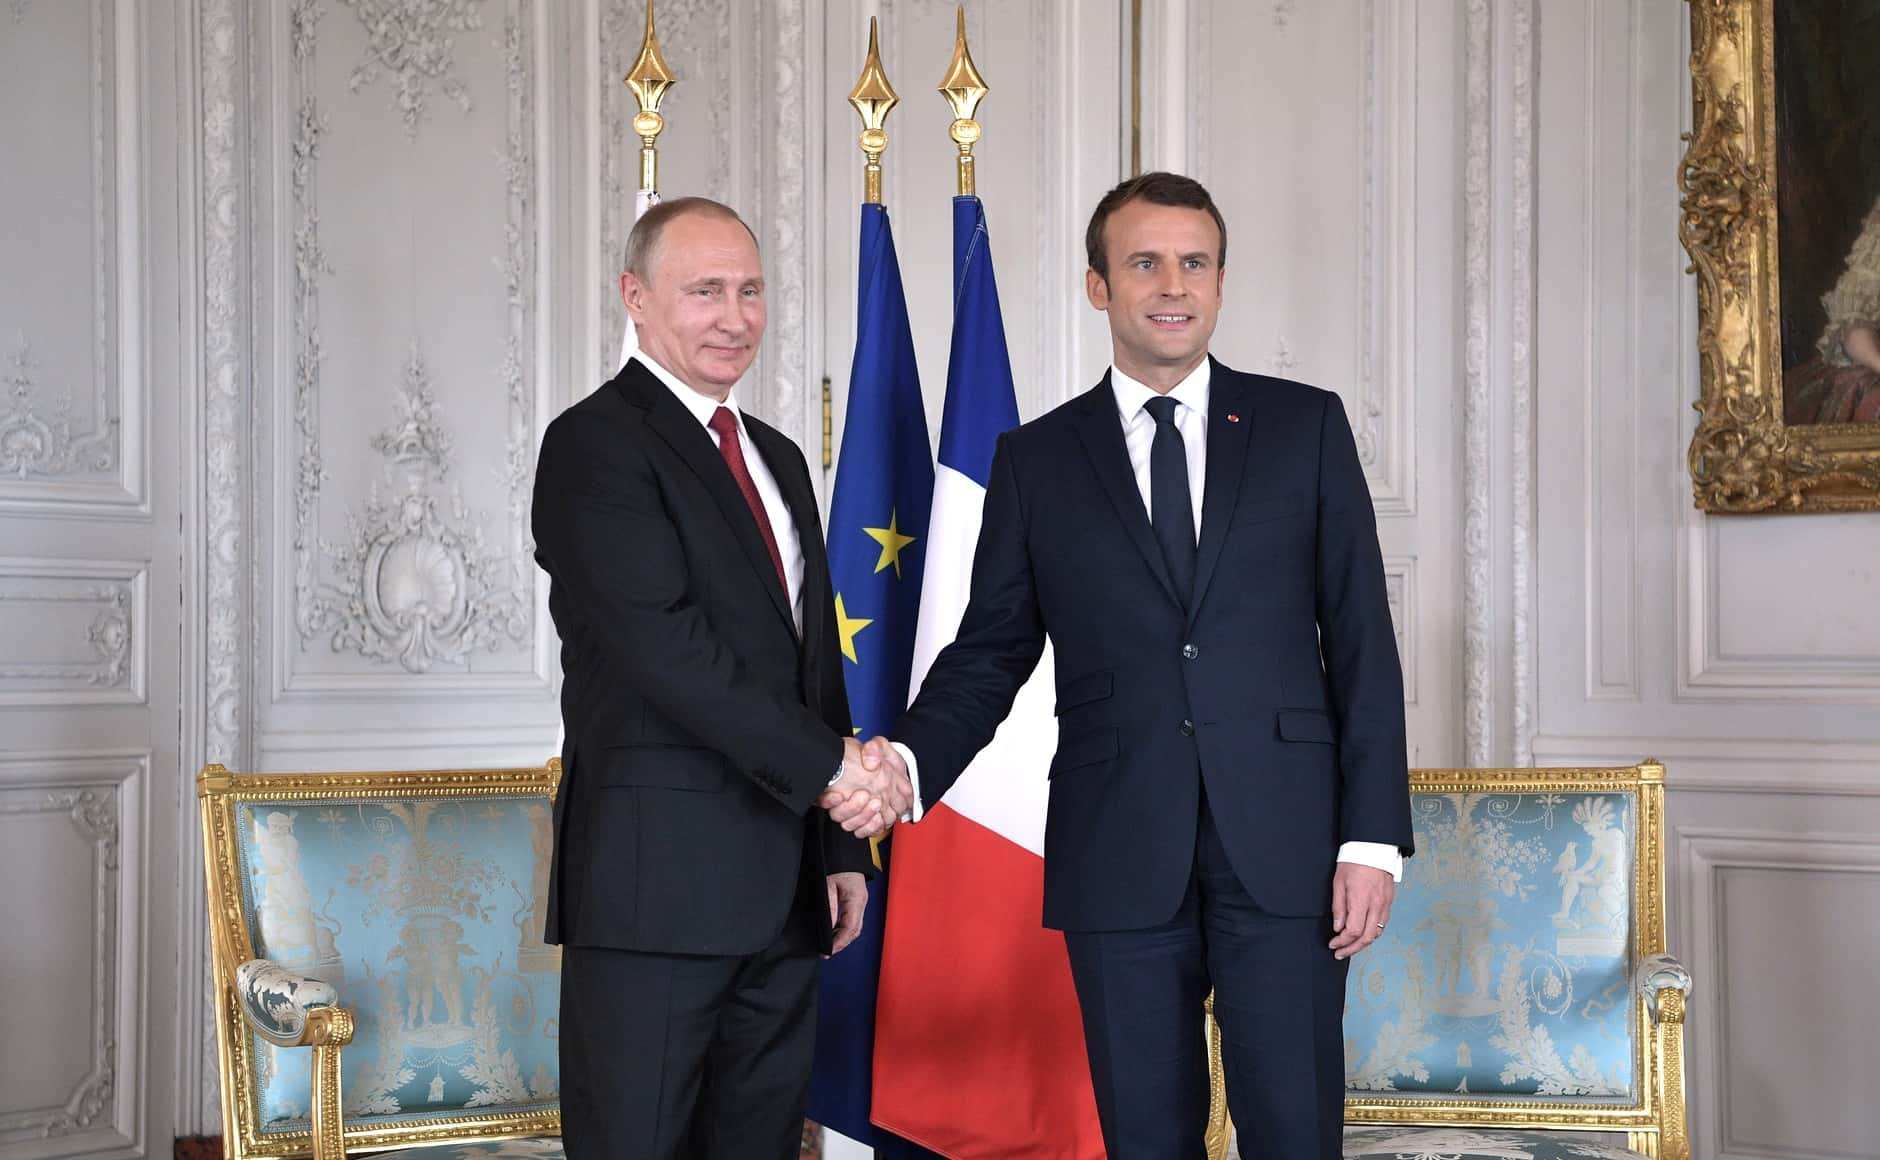 Wladimir Poutine et Emmanuel_Macron.